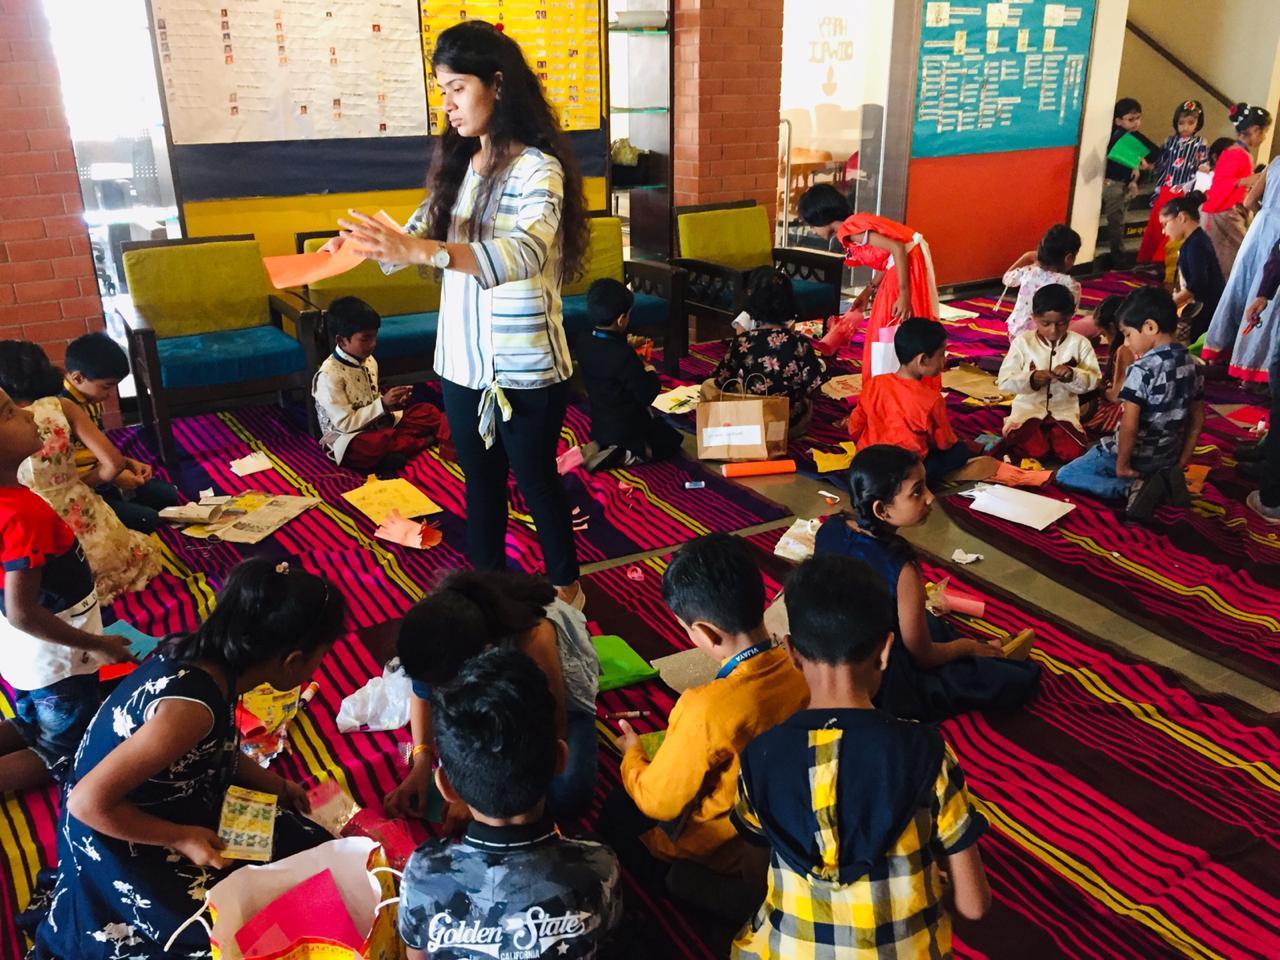 vijaya-convent-school-amravati-diwali-celebration-2019